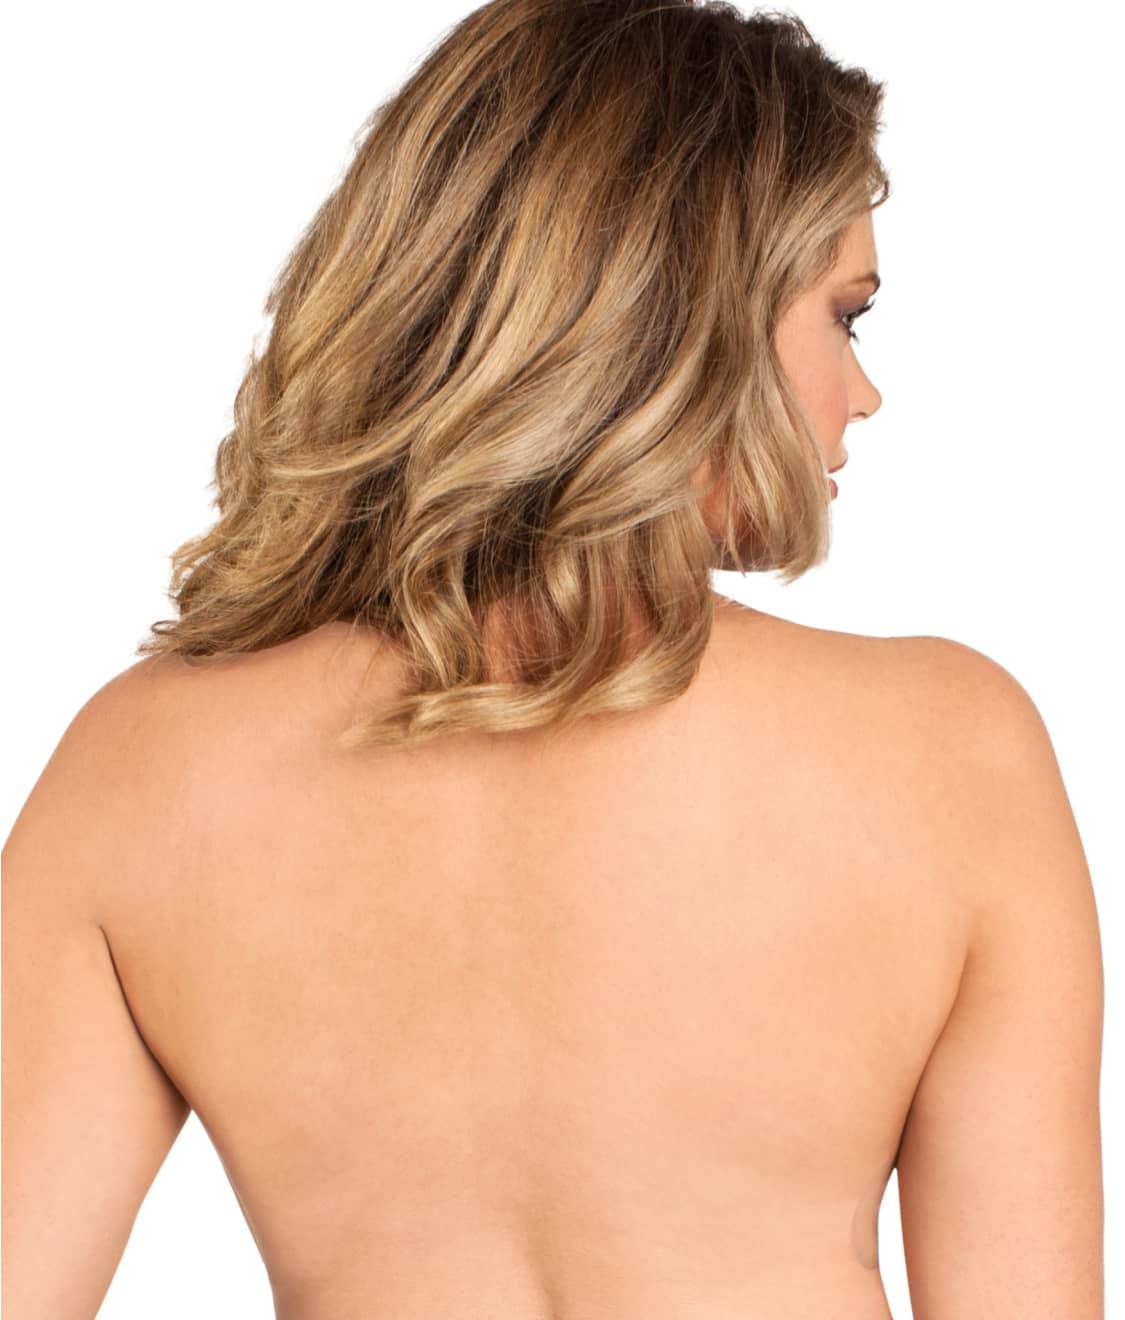 c8c0252bce2e0 Fashion Forms Voluptuous U Plunge Backless Strapless Bra